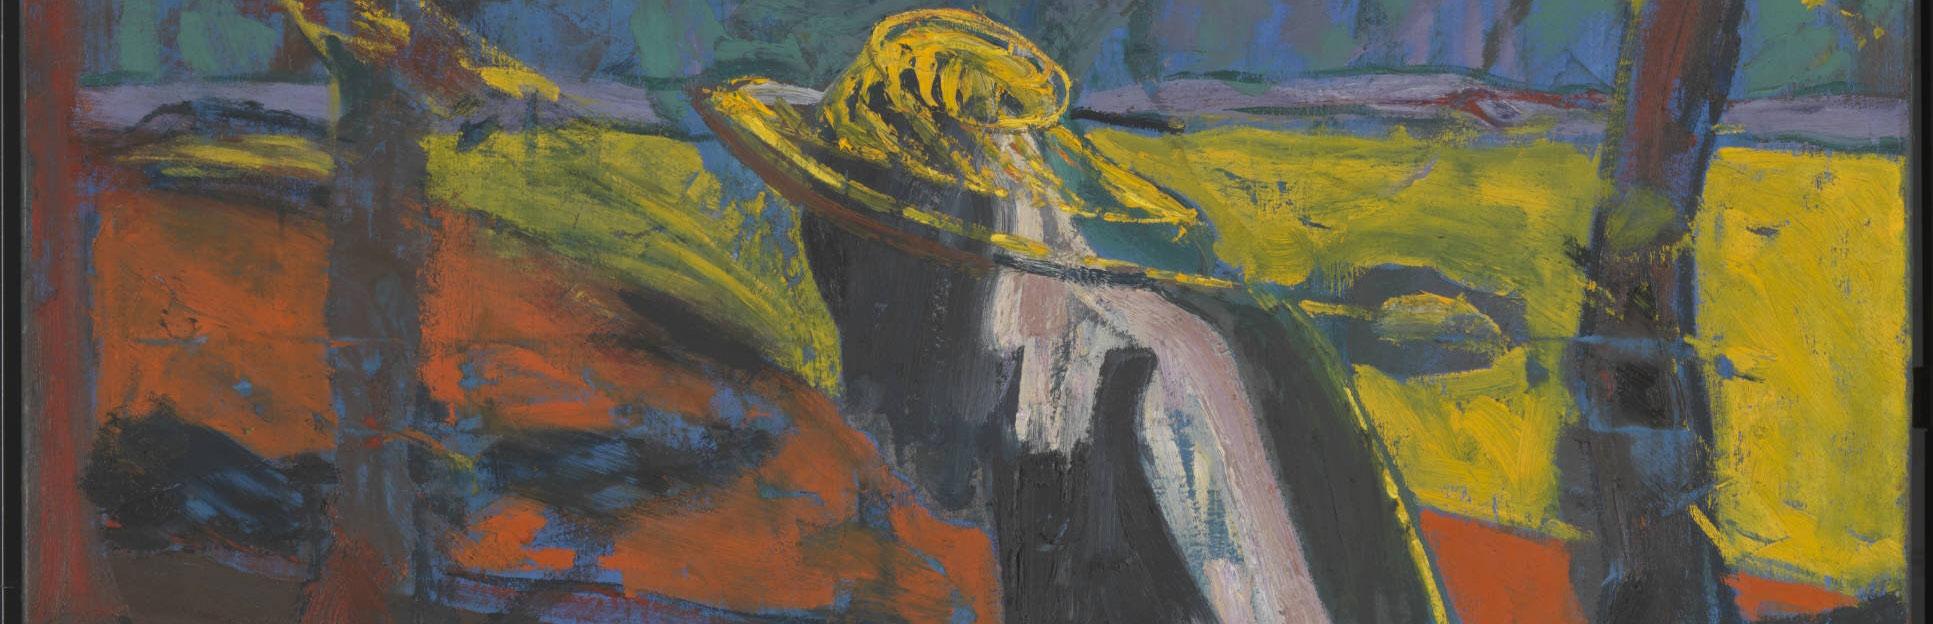 London inspired Van Gogh painting